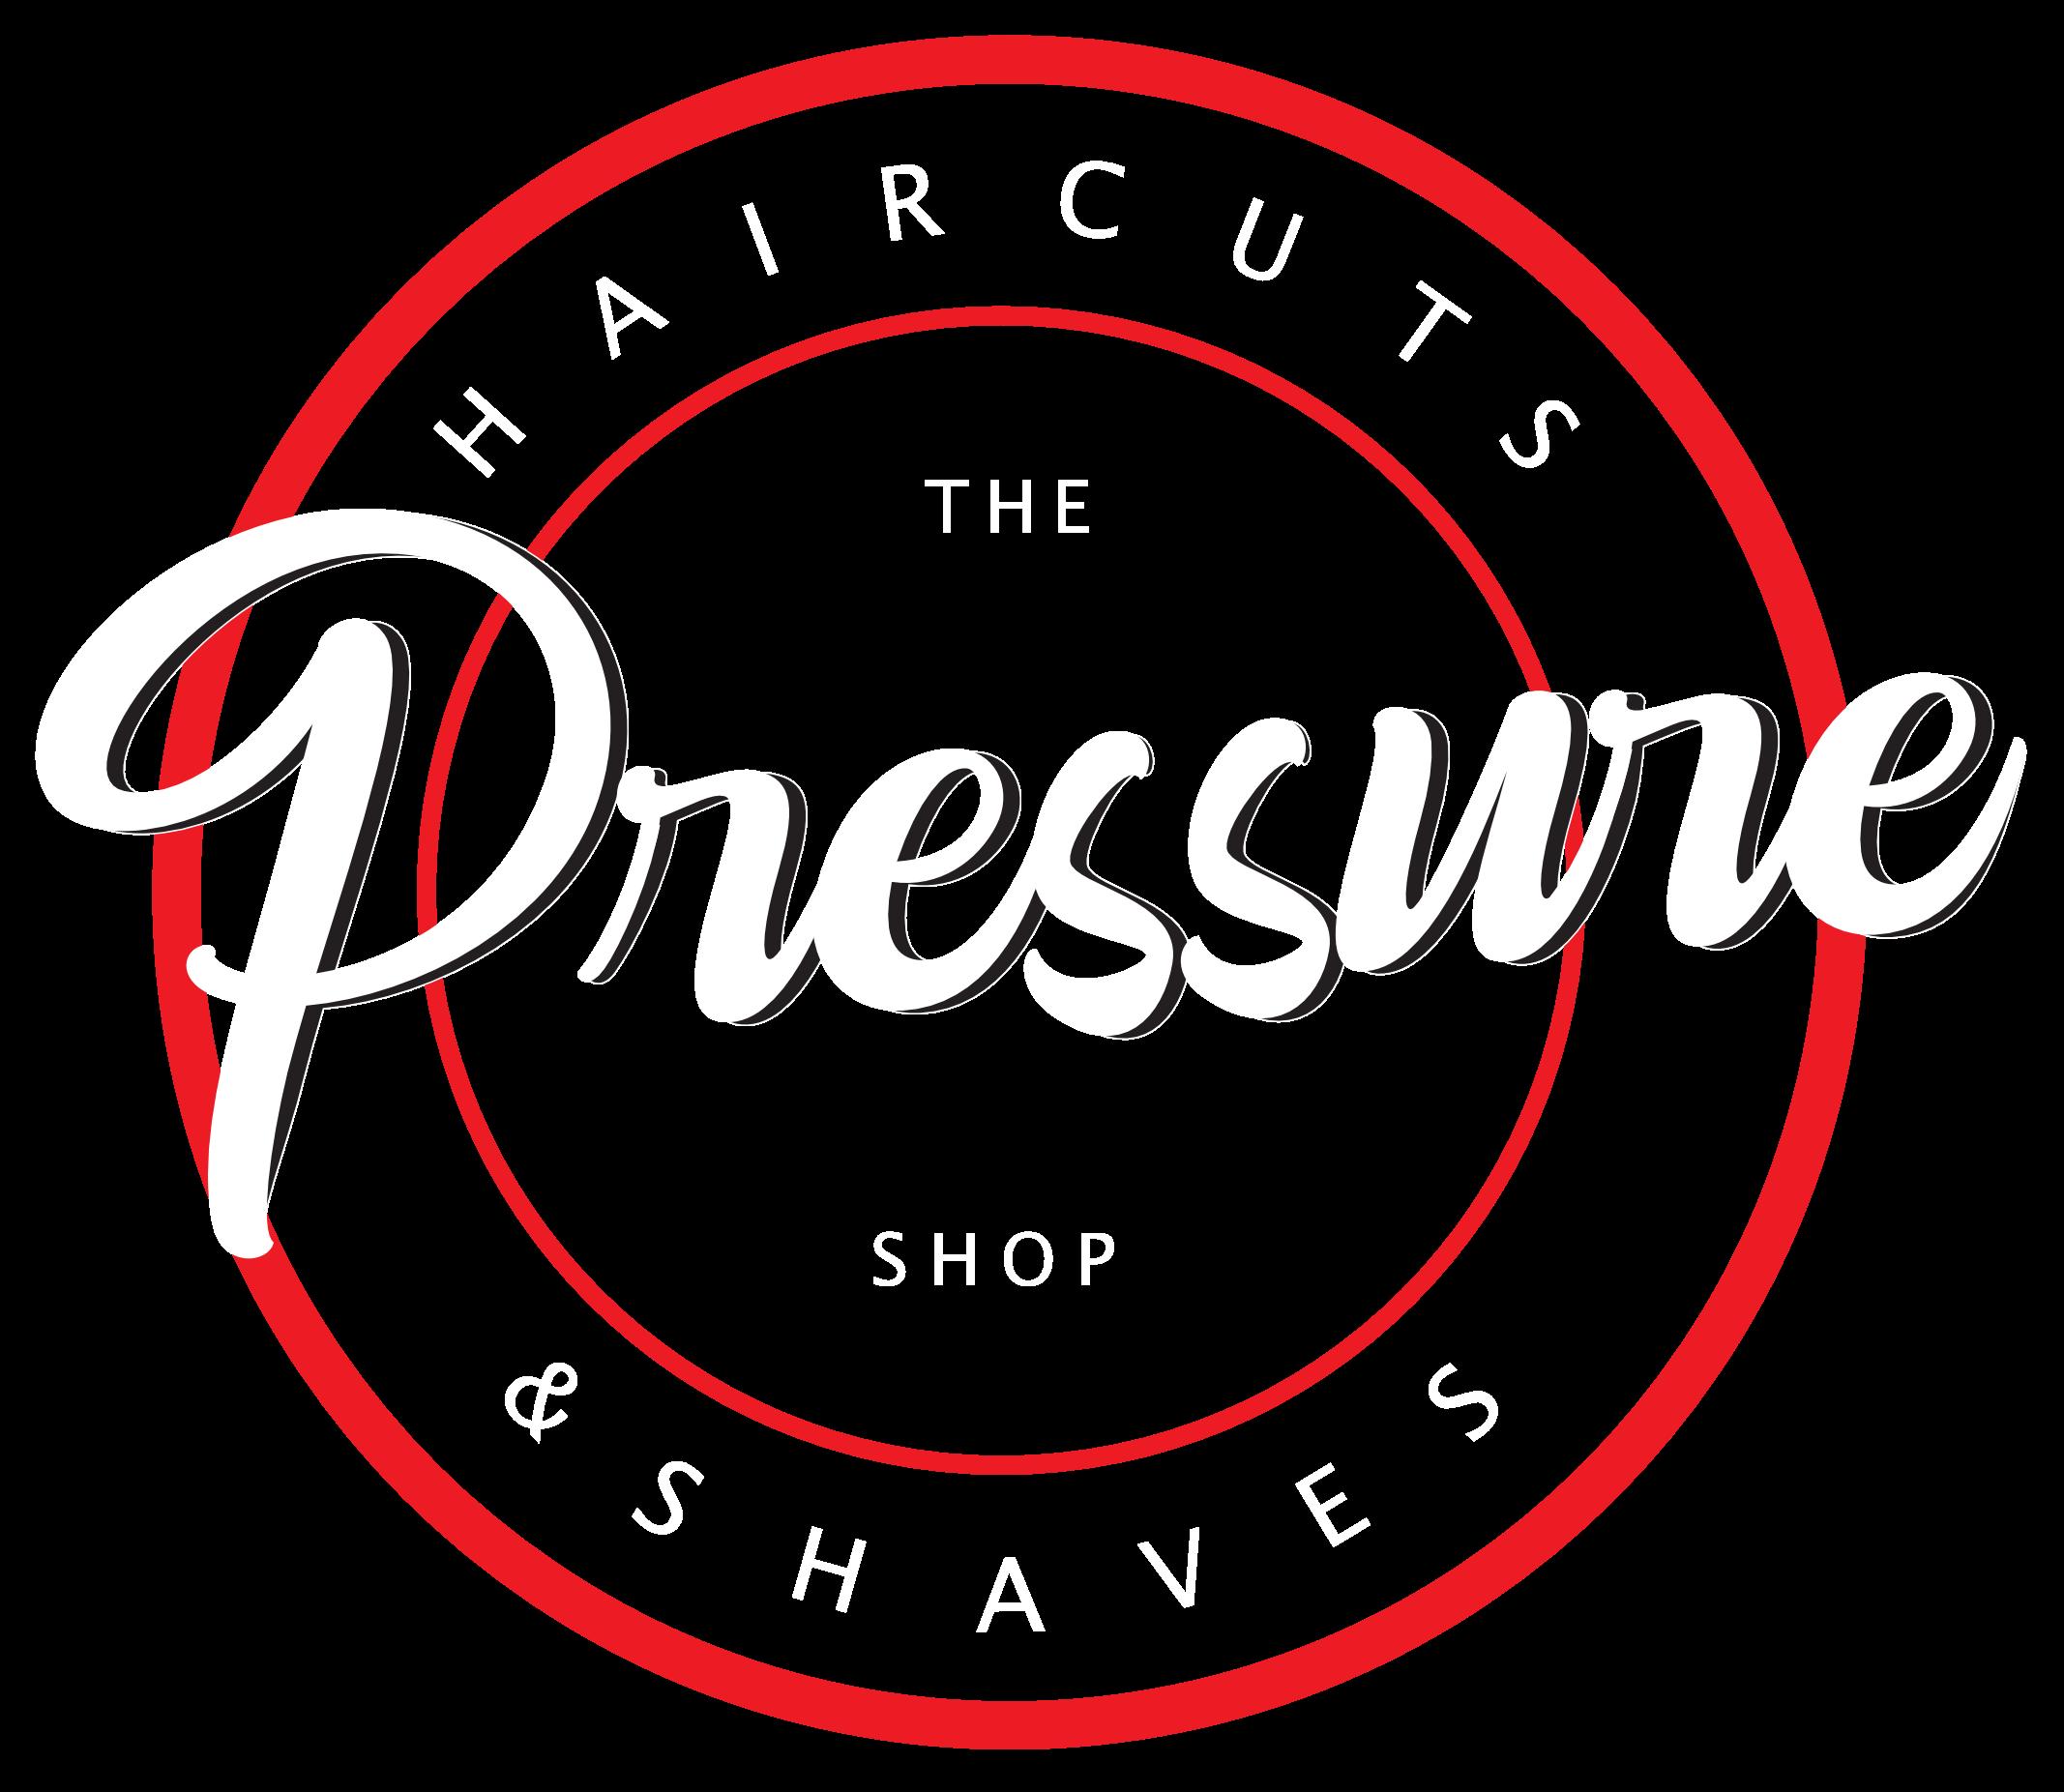 The Pressure Shop in Arcata, CA